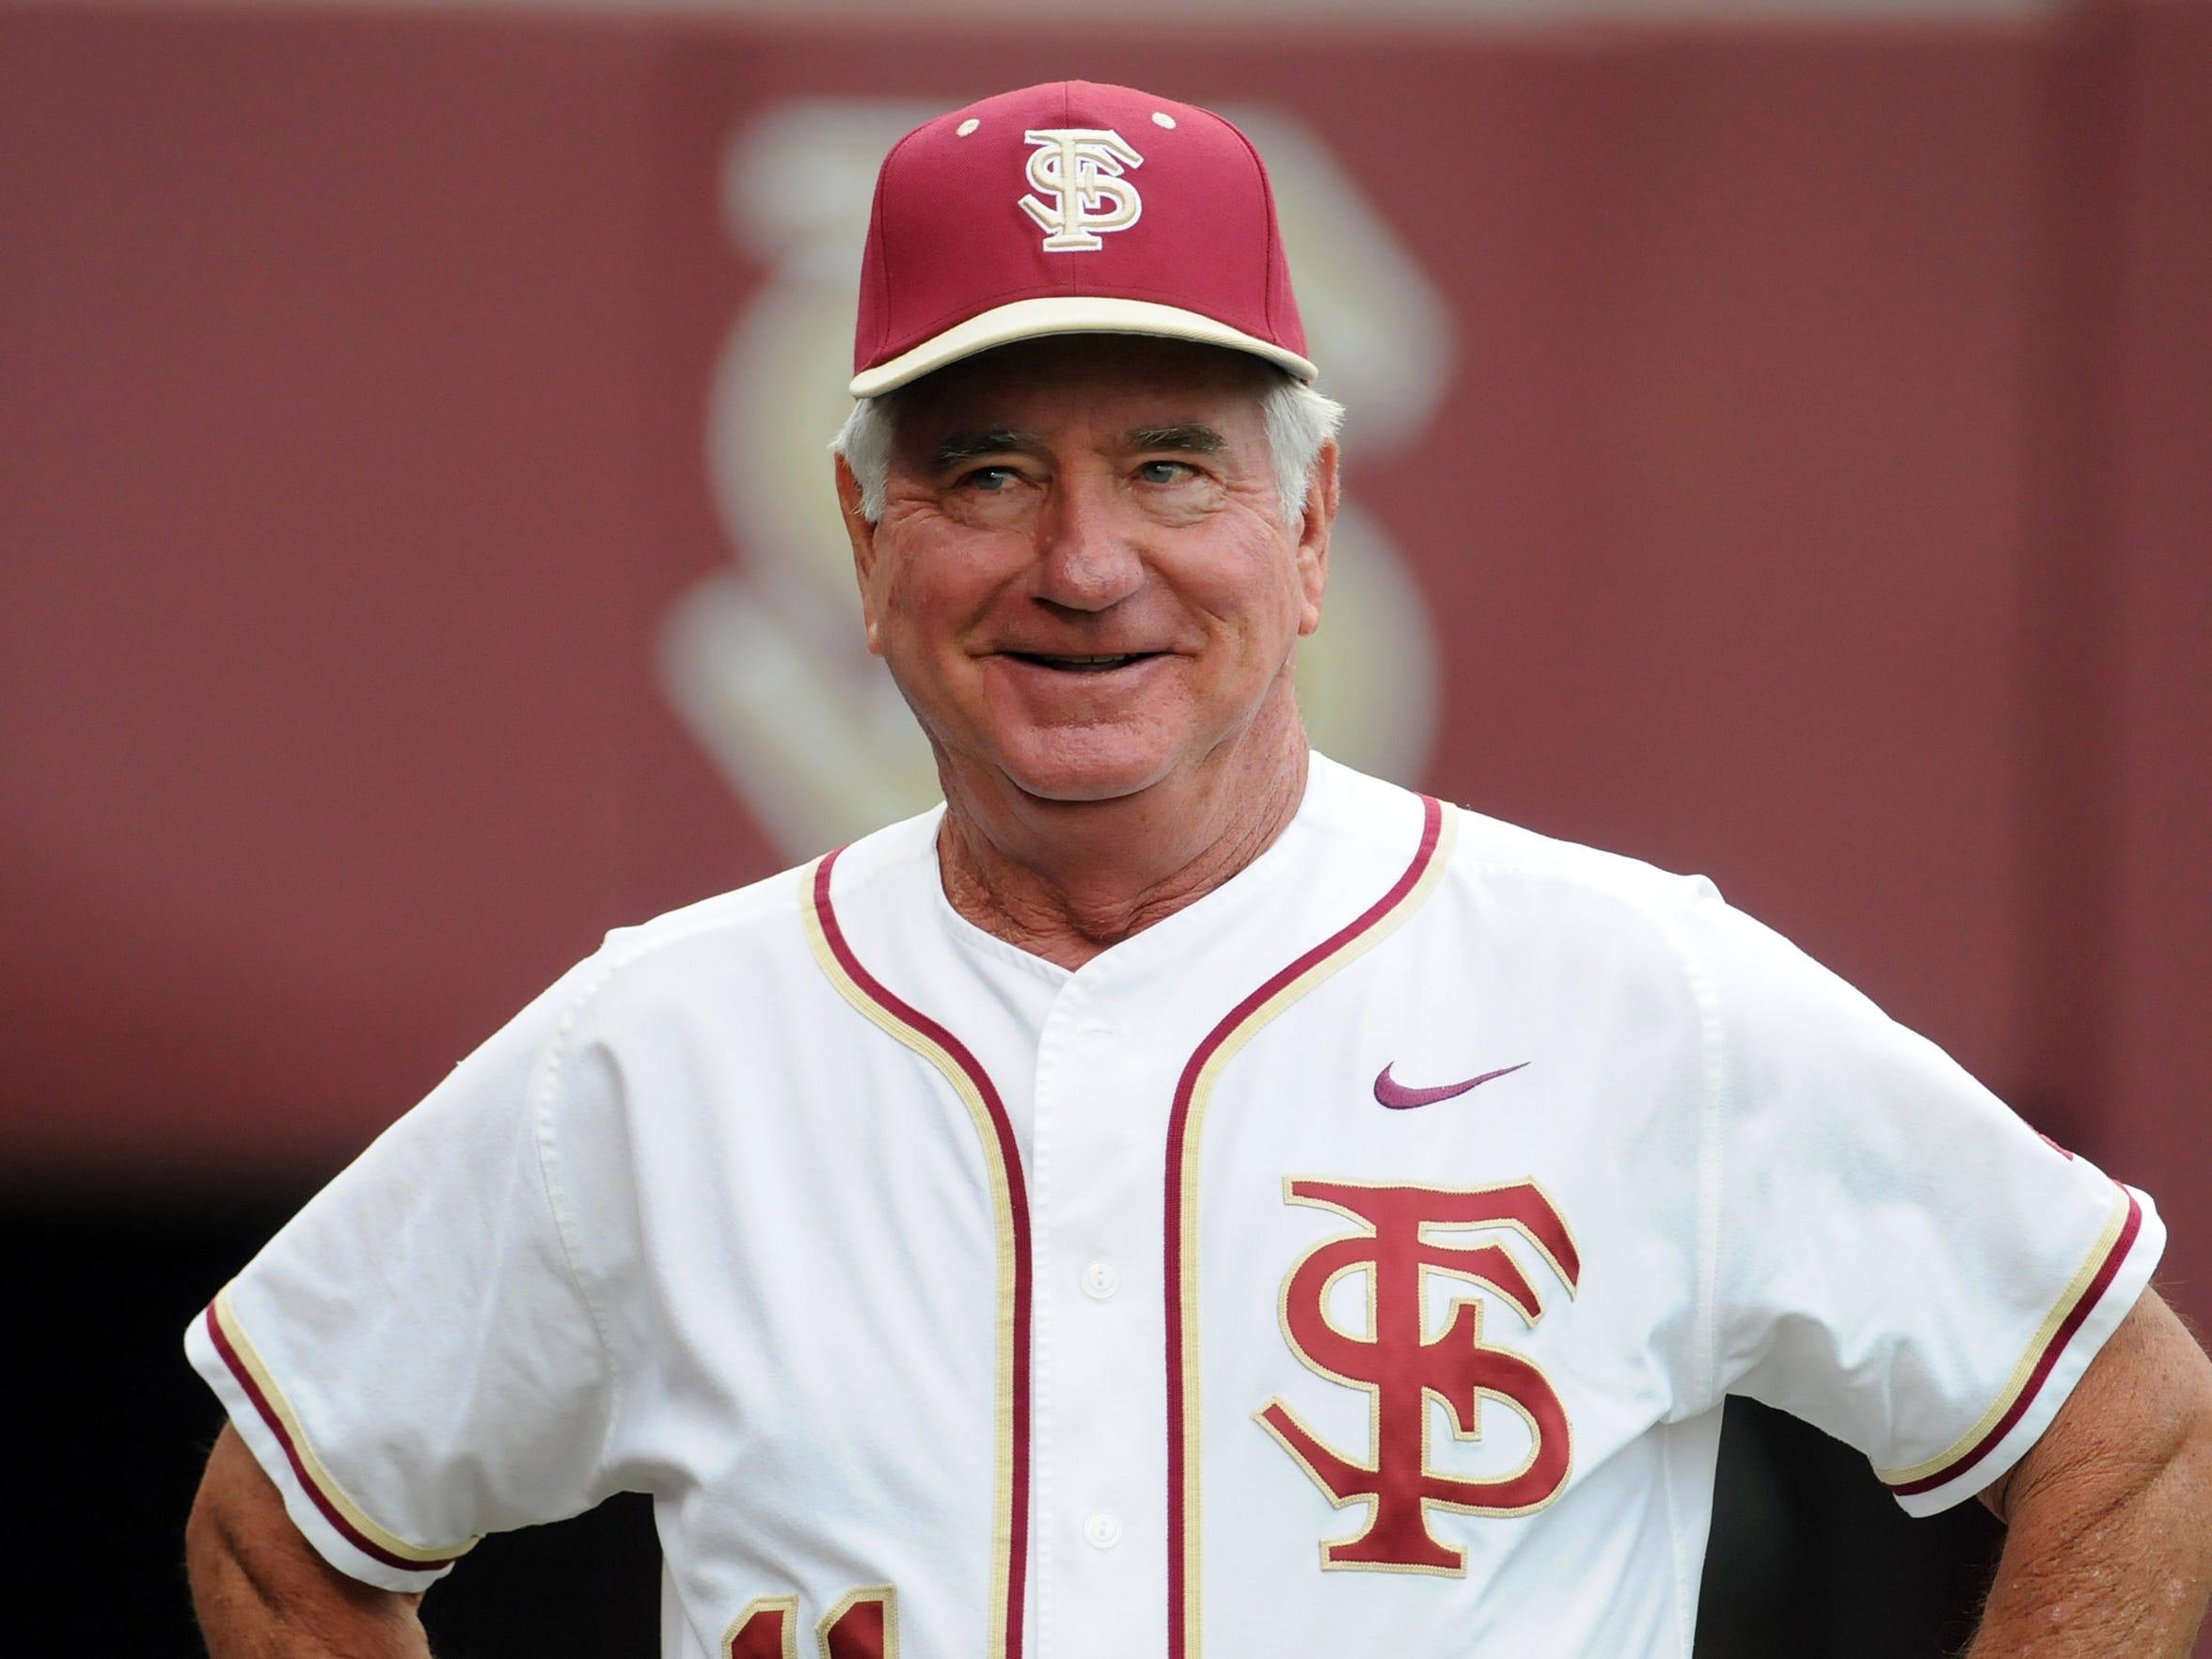 Entering his 38th season as Florida State's head coach,